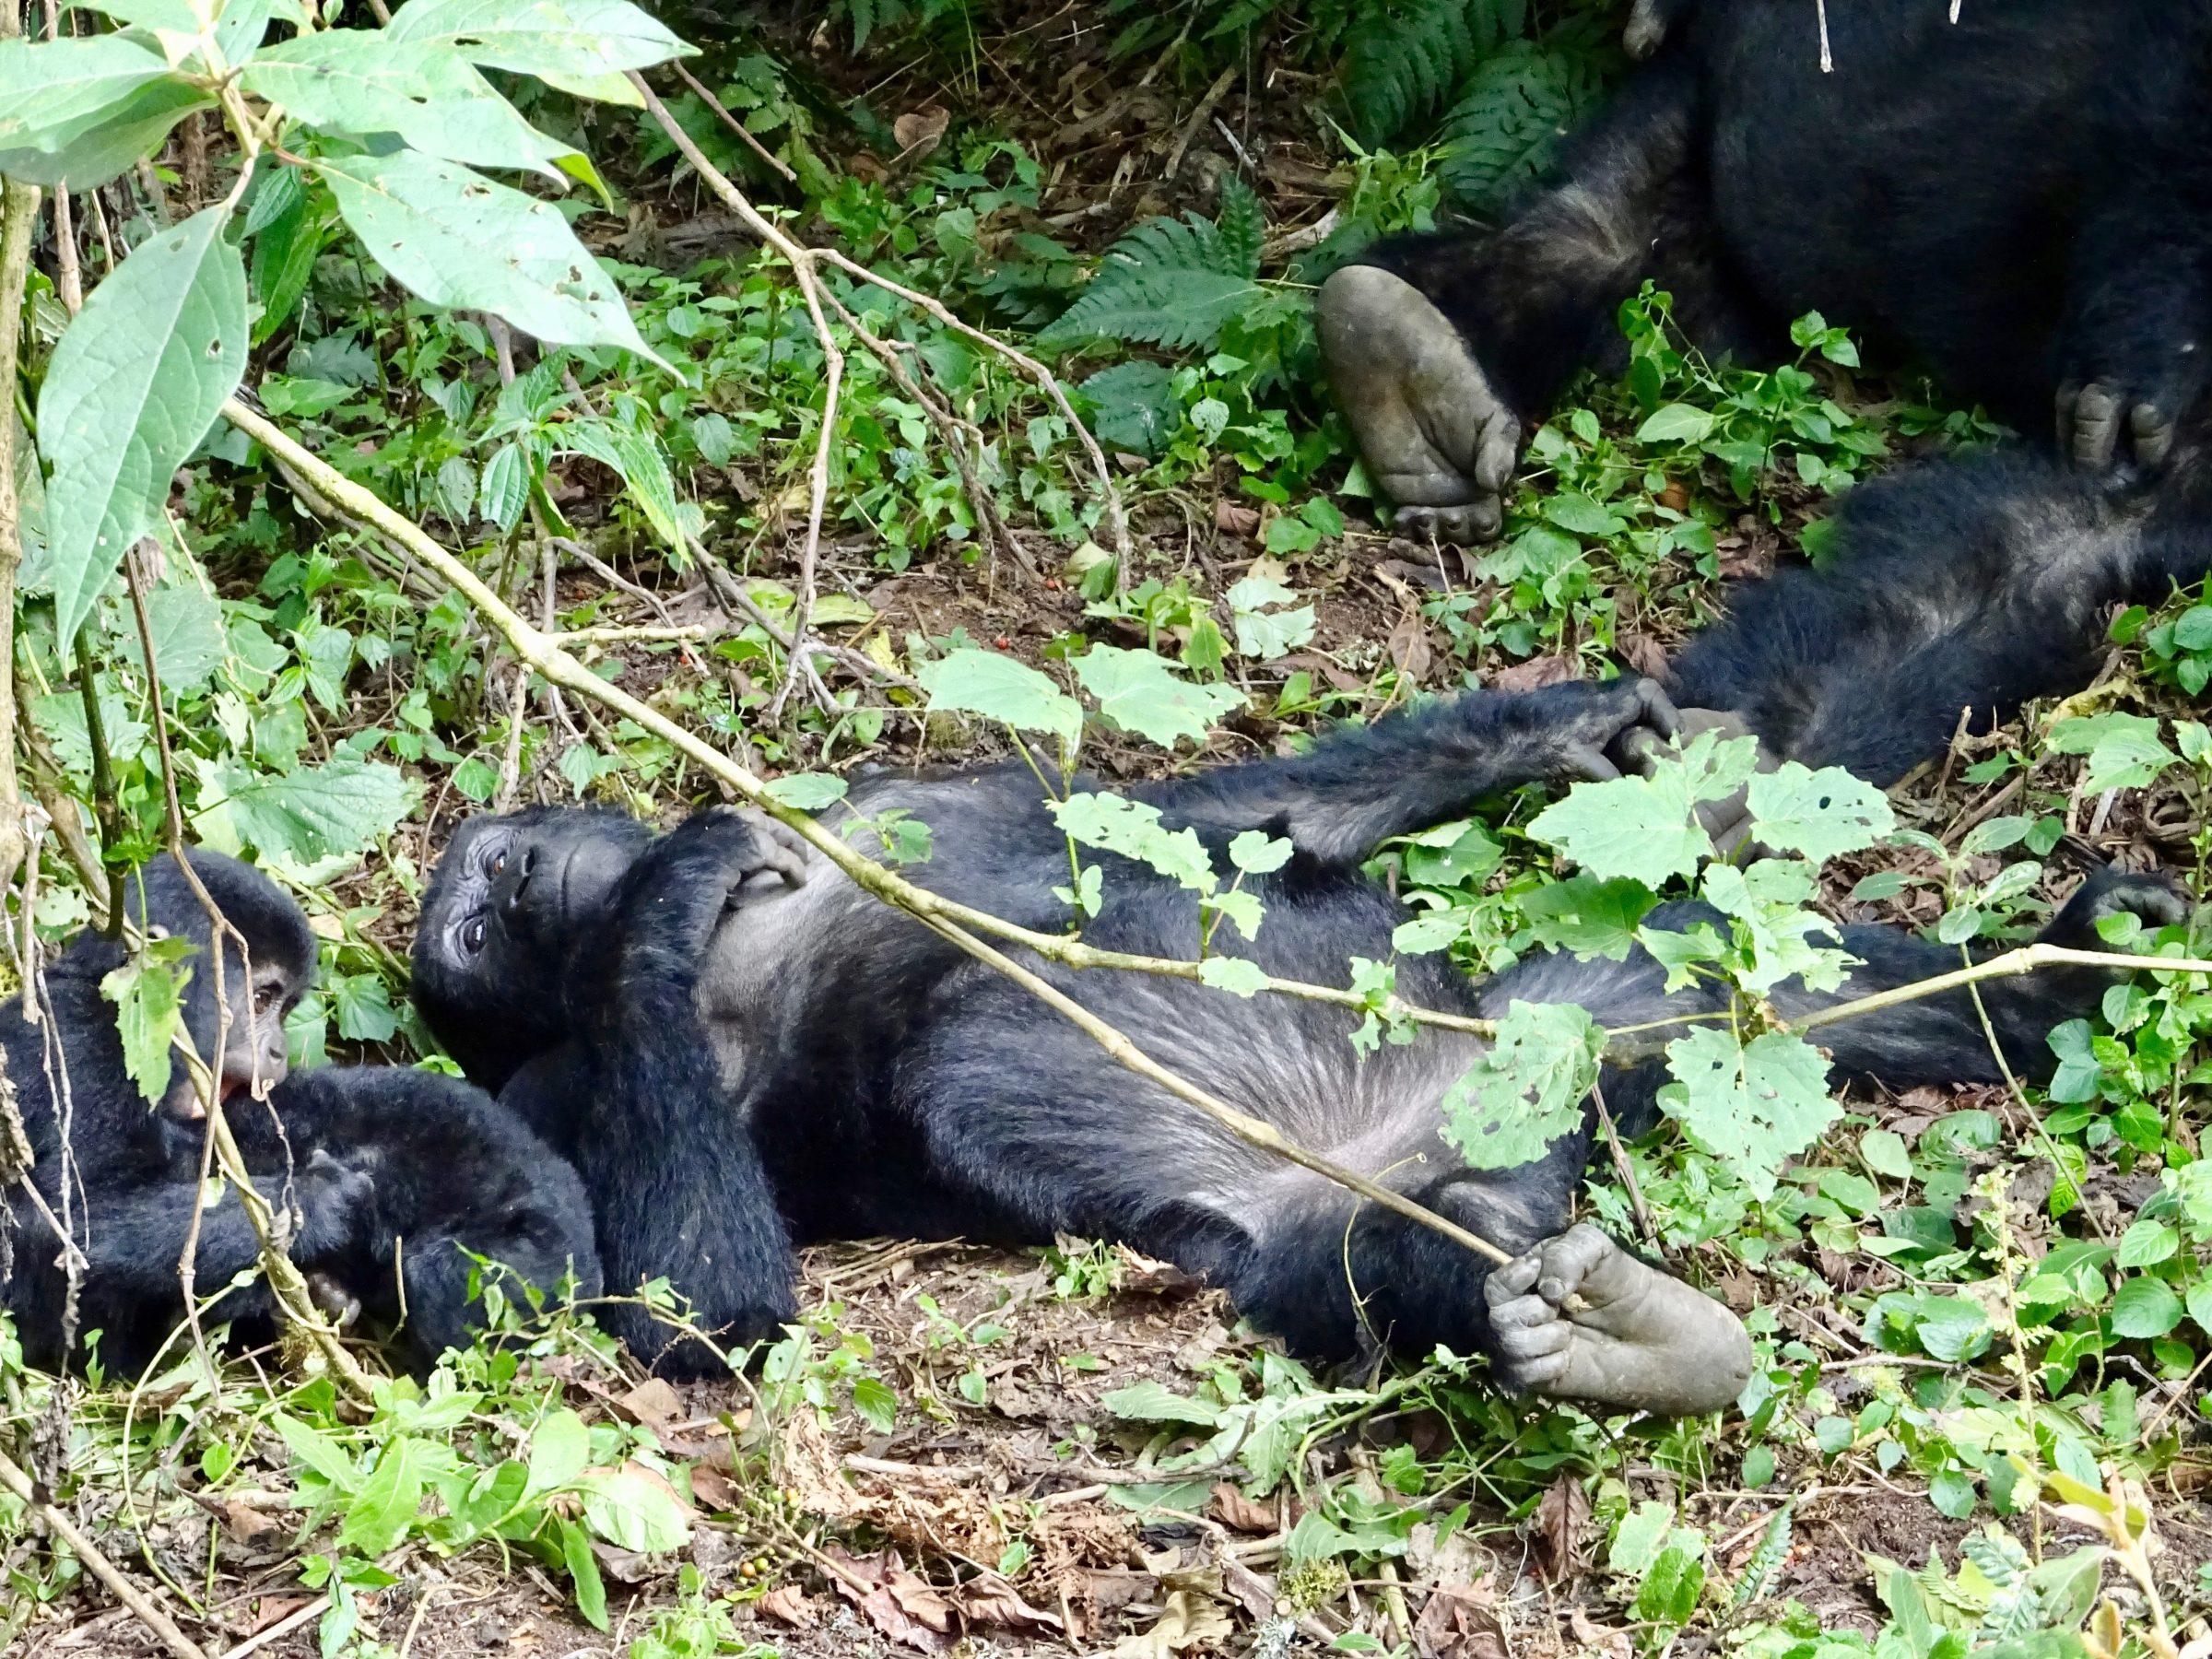 Compleet relaxte gorilla's in Bwindi